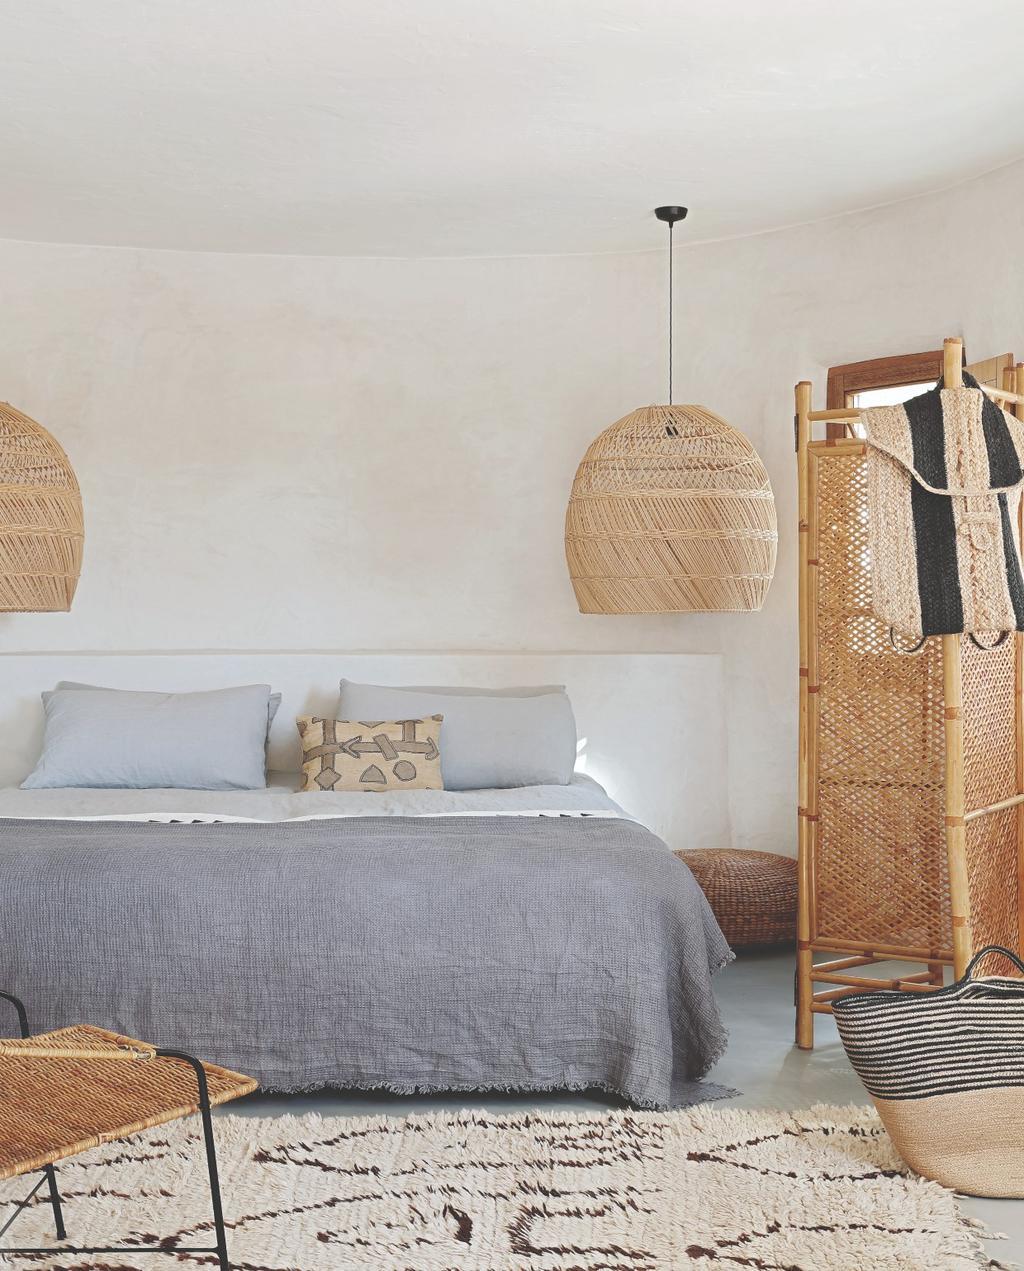 vtwonen 07-2020 binnenkijken ibiza slaapkamer rotan roomdivider